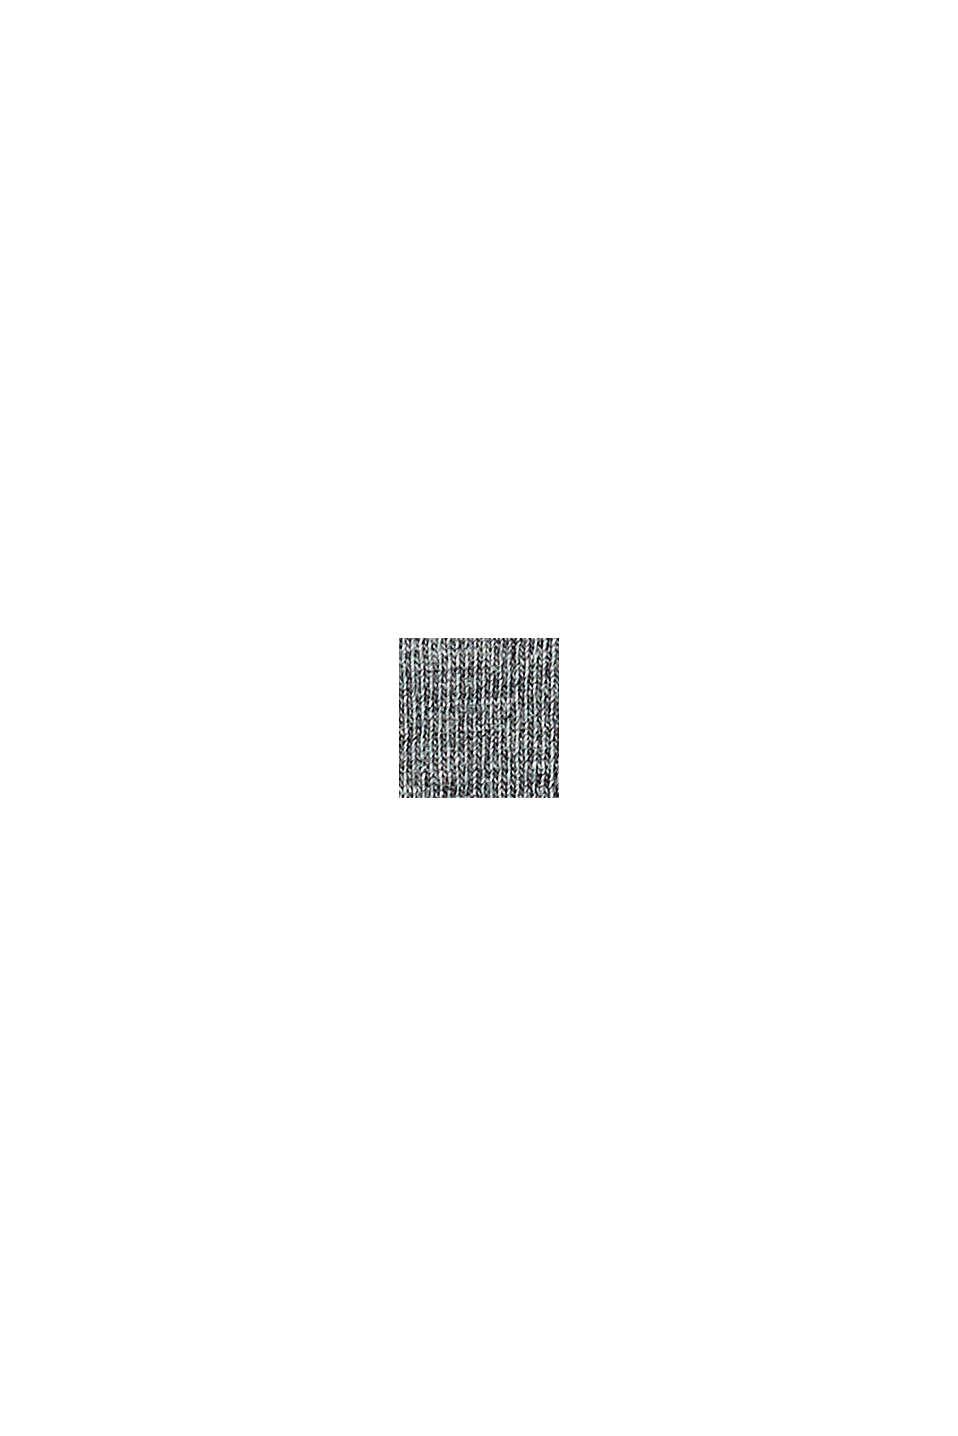 Calze con bordini arrotolati in misto cotone, LIGHT GREY MELANGE, swatch